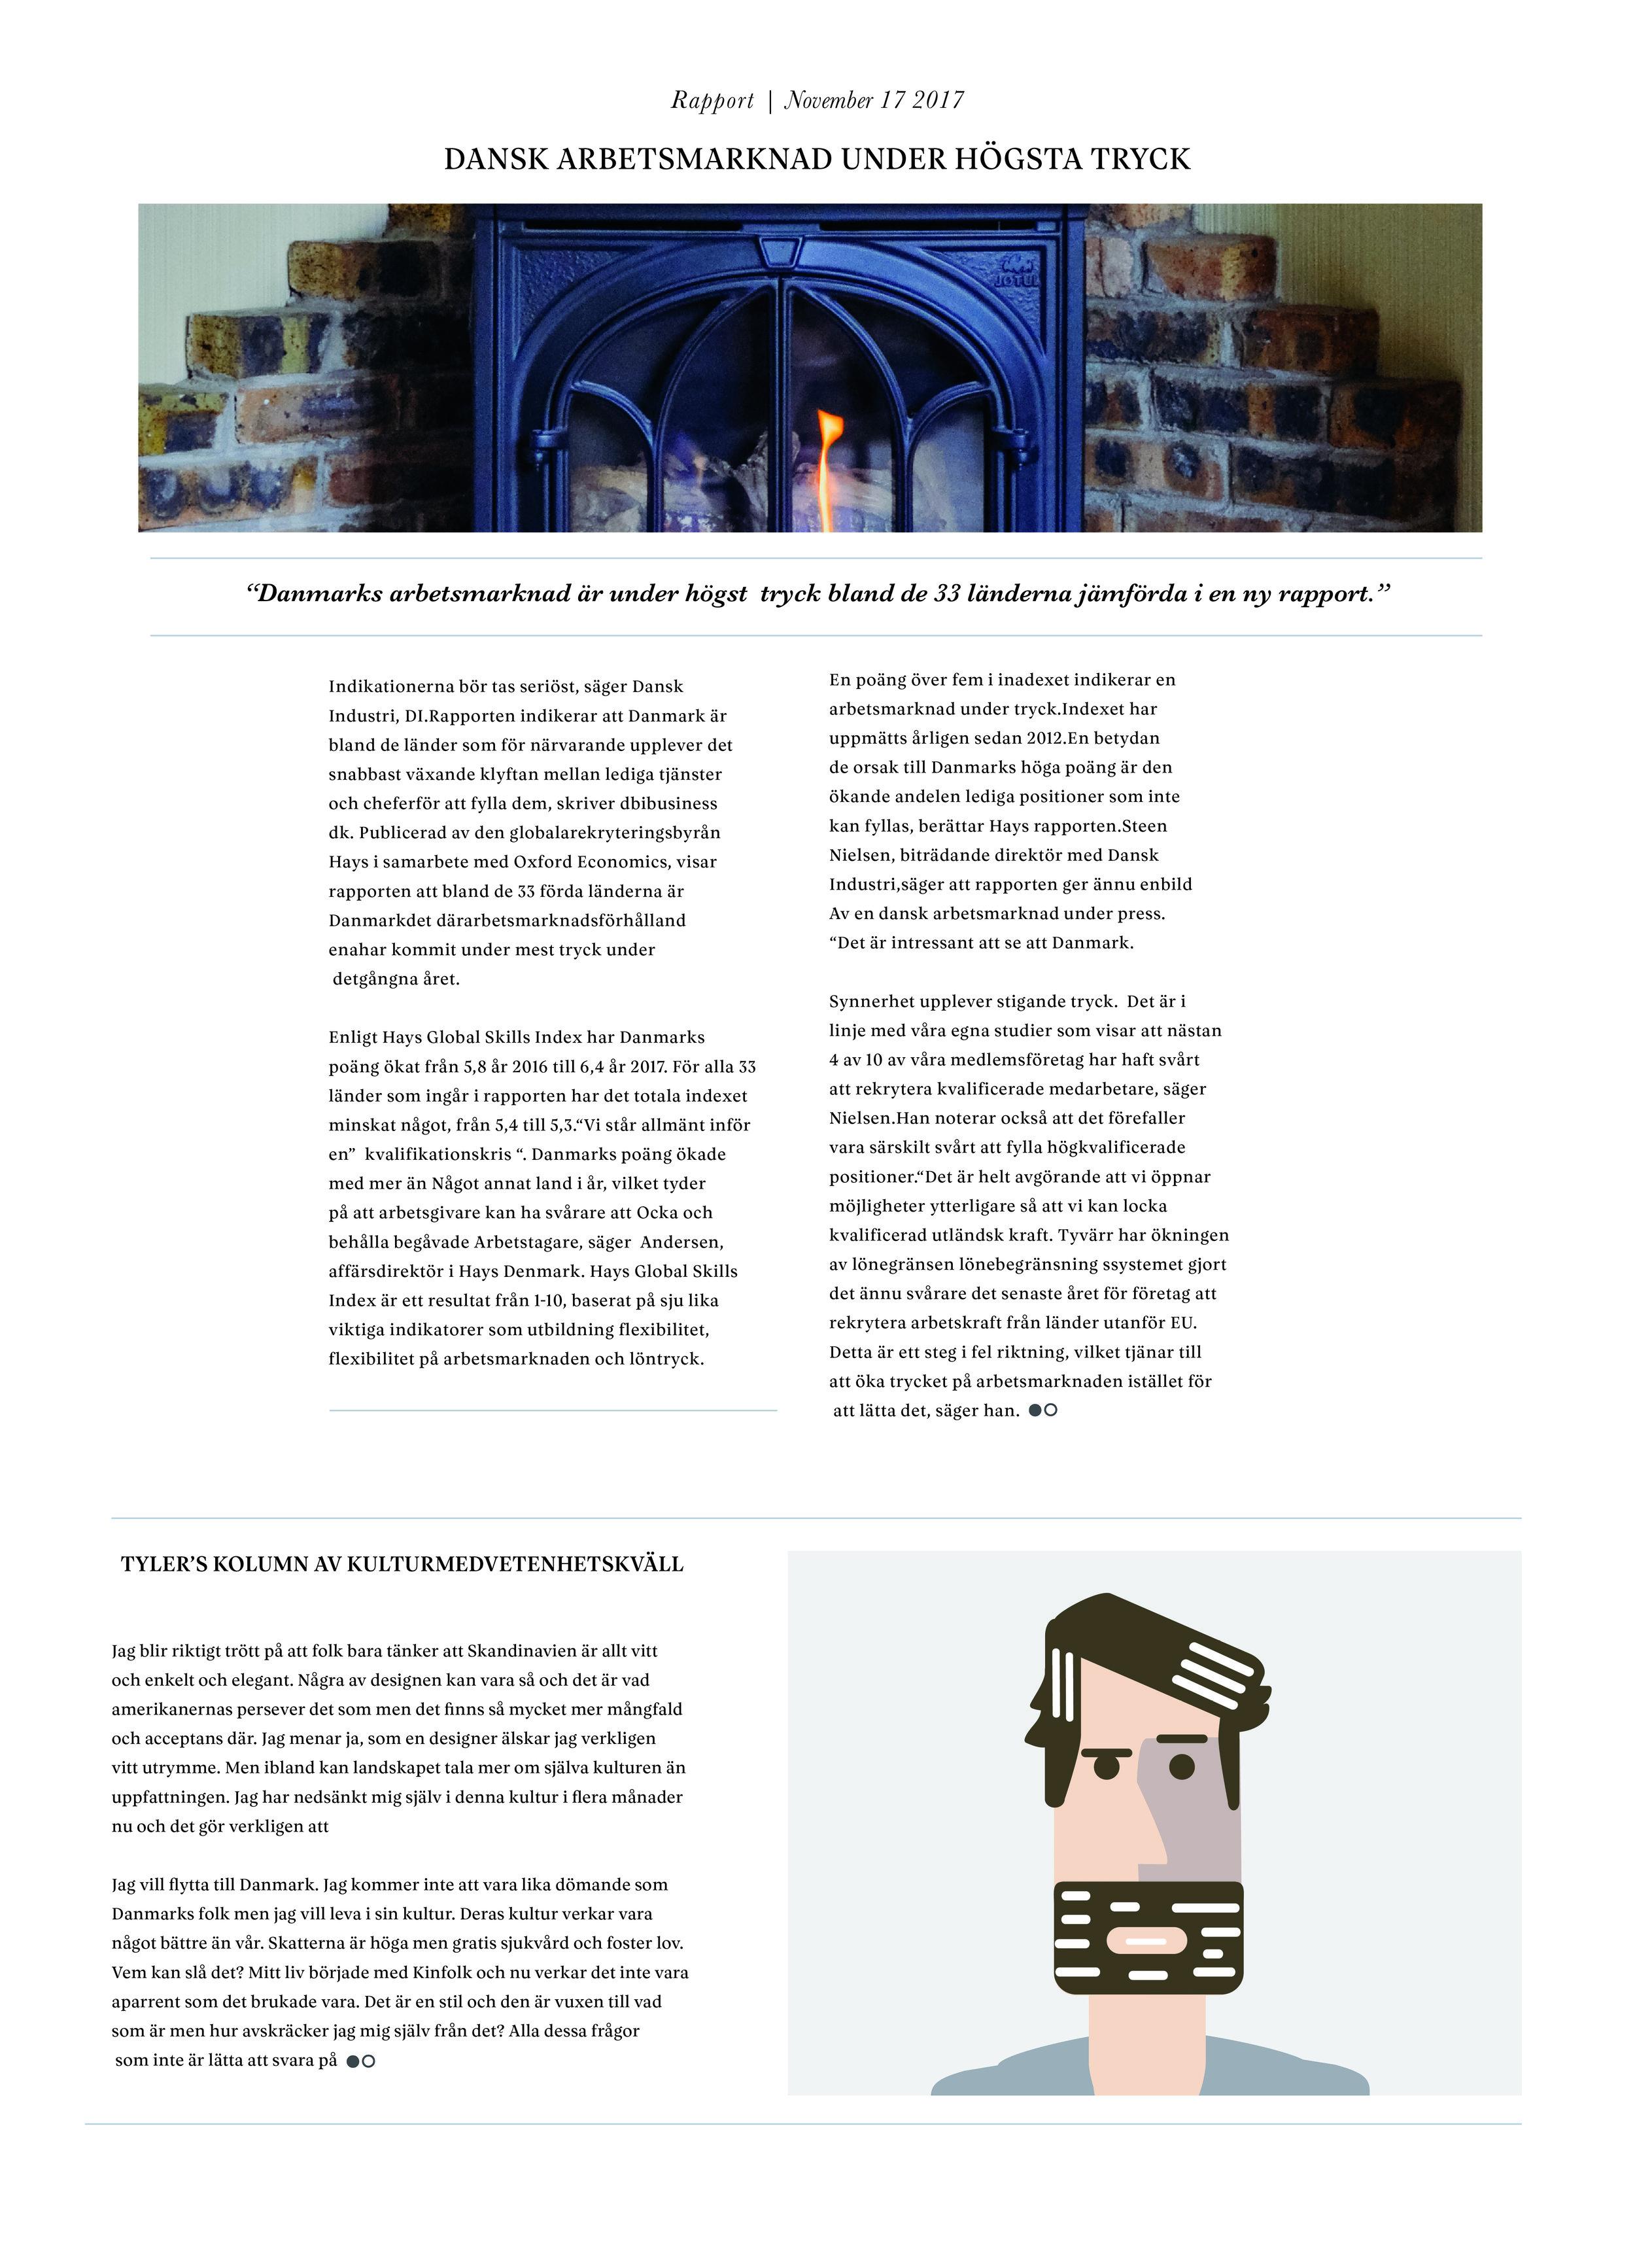 Livsstil_Newspaper_Final2.jpg